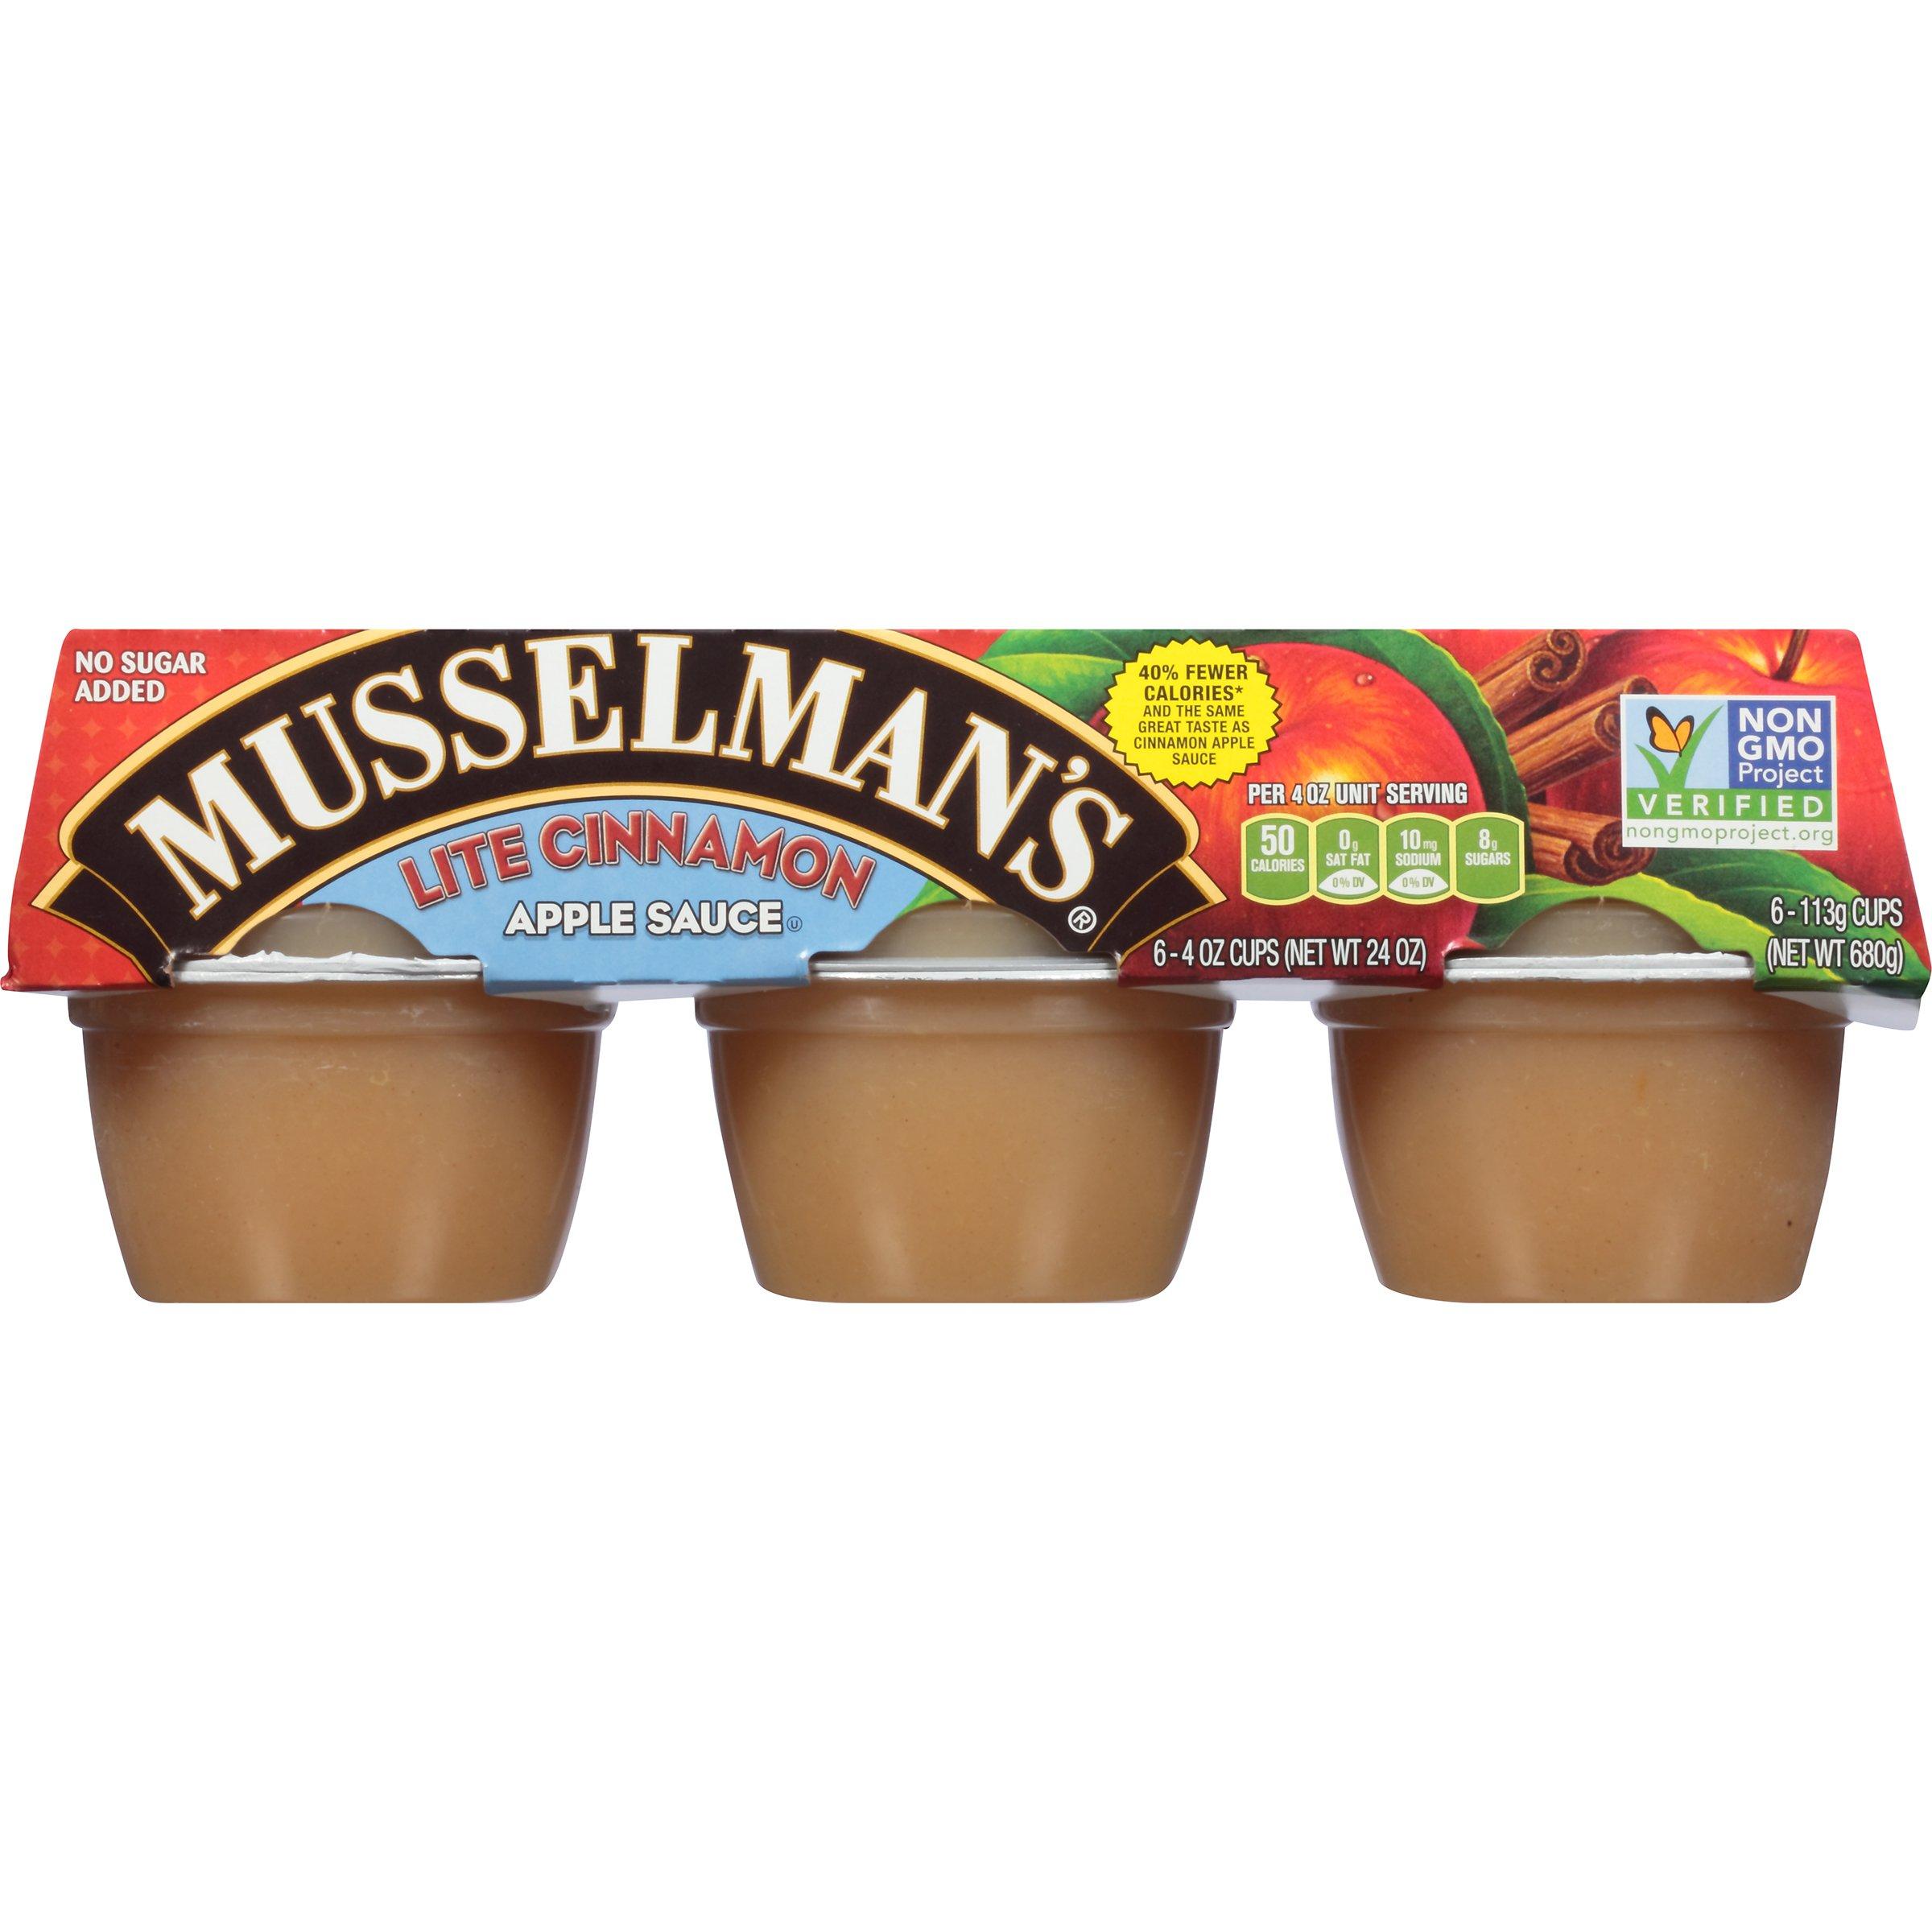 Musselman's Lite Cinnamon Apple Sauce, 4 Ounce (Pack of 12) by Musselmans (Image #4)